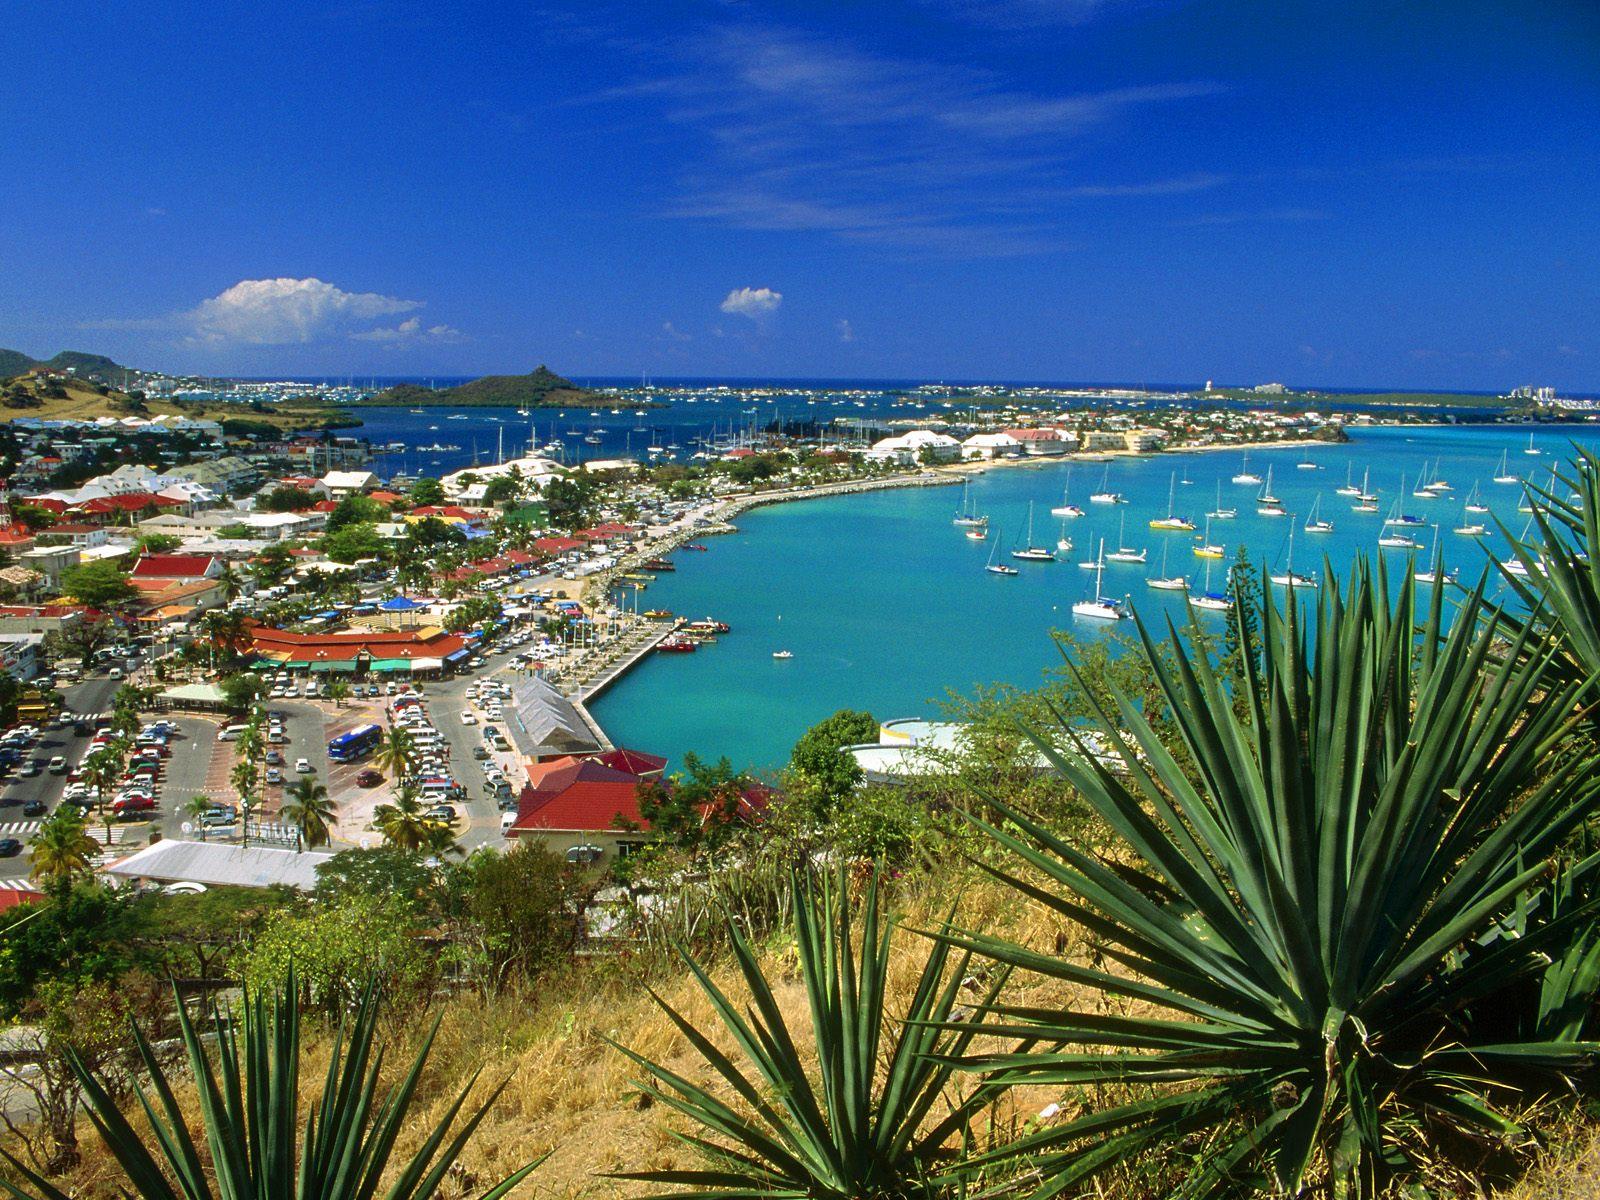 https://3.bp.blogspot.com/-dlEQ9ydU55o/Tv3nlqh6oKI/AAAAAAAADZg/mWB5S_UaV-Y/s1600/Marigot+Bay%252C+Saint+Martin%252C+French+West+Indies.jpg